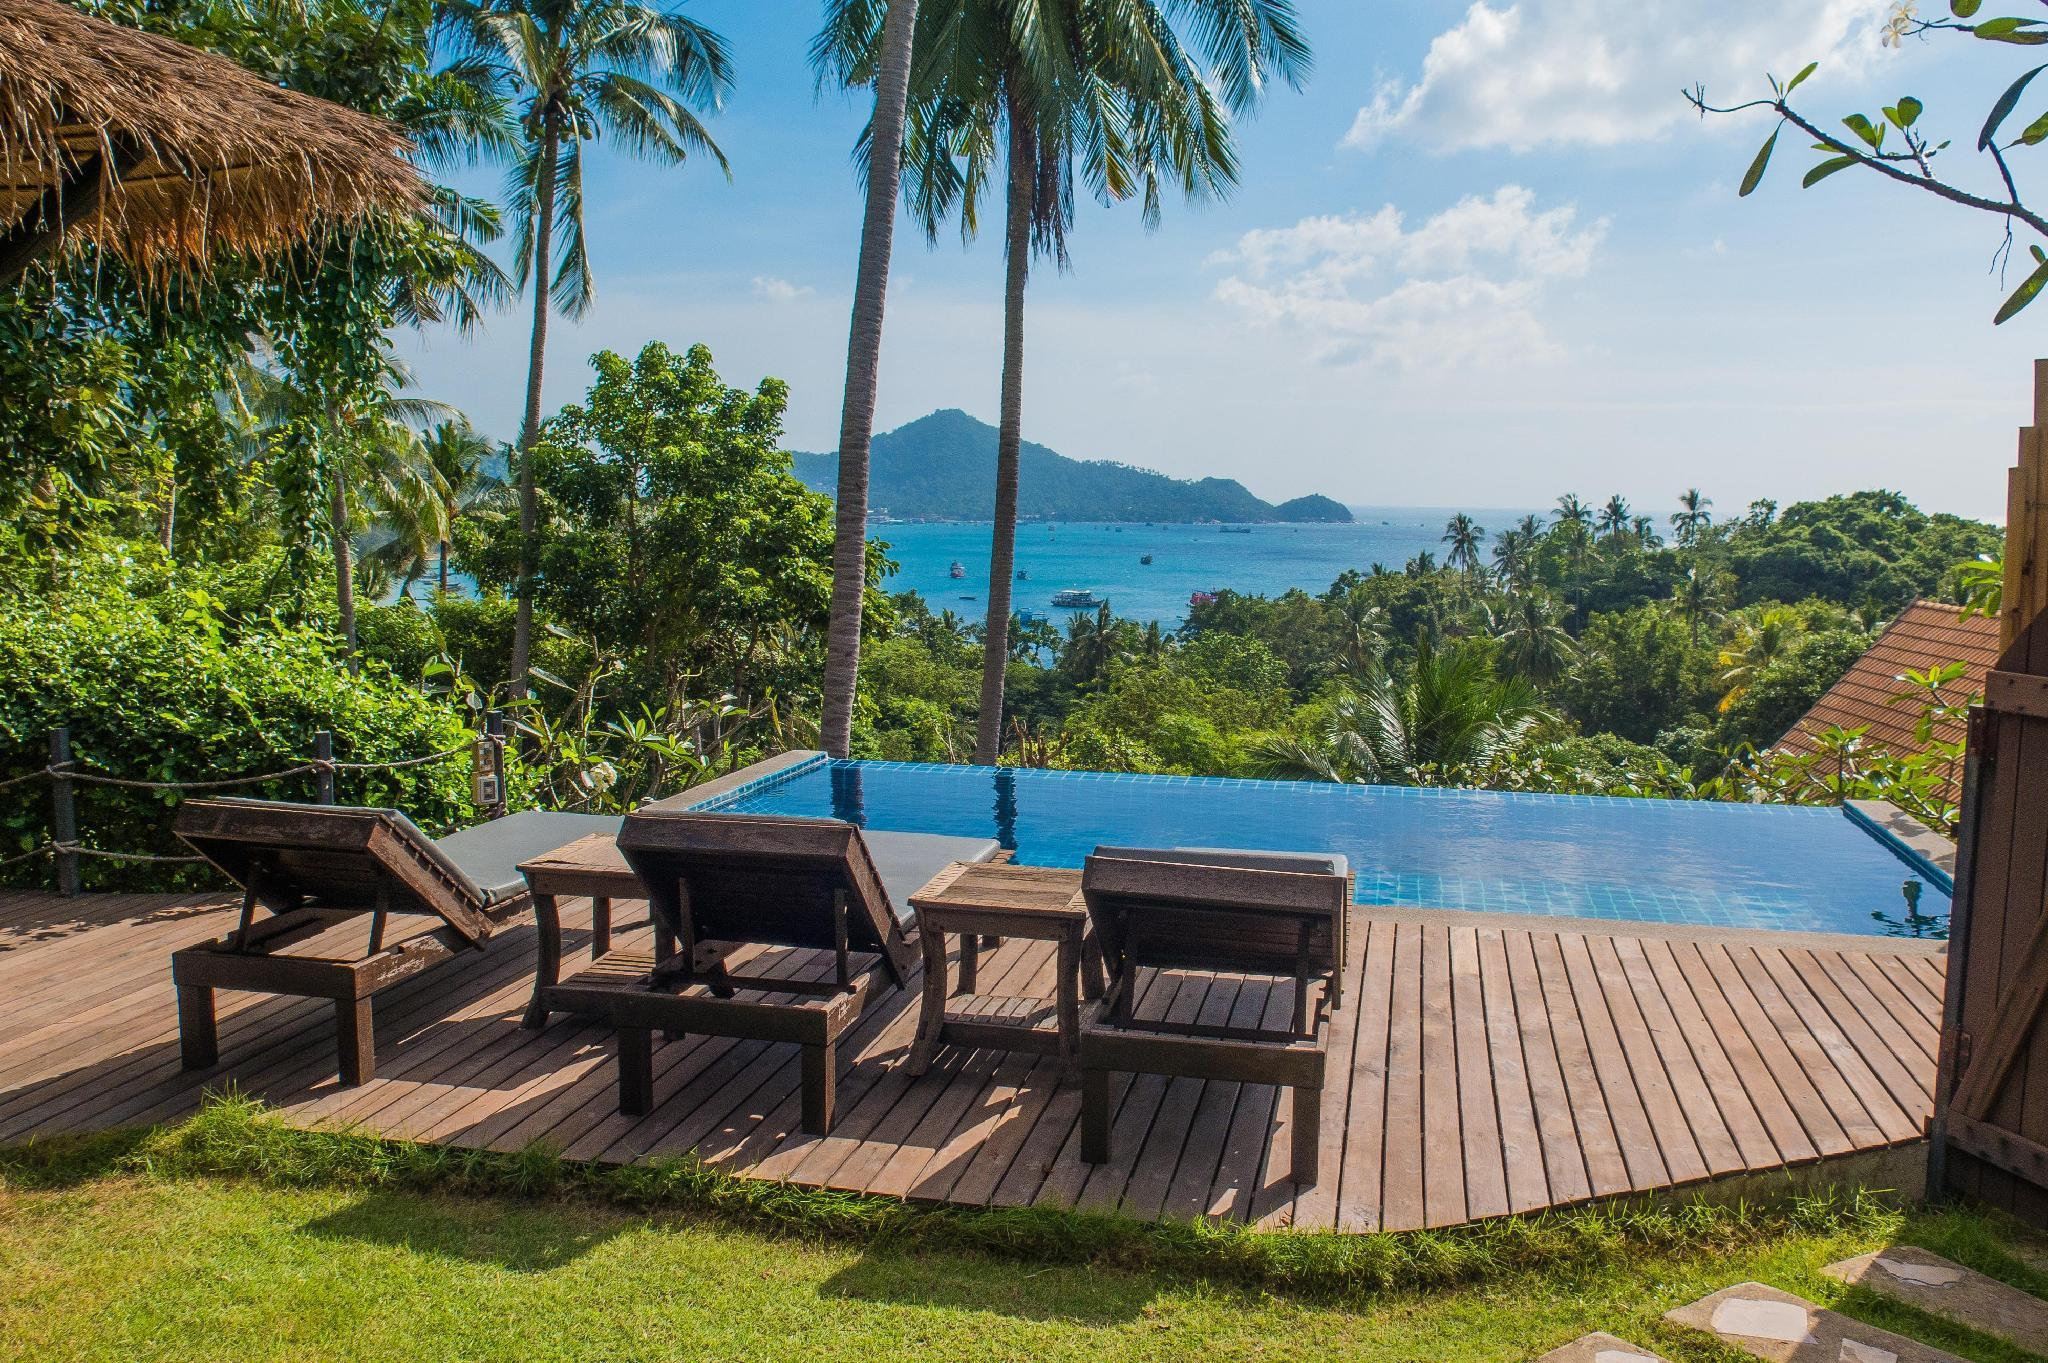 Koh Tao Heights Boutique Villa เกาะเต่า ไฮทส์ บูติก วิลลา